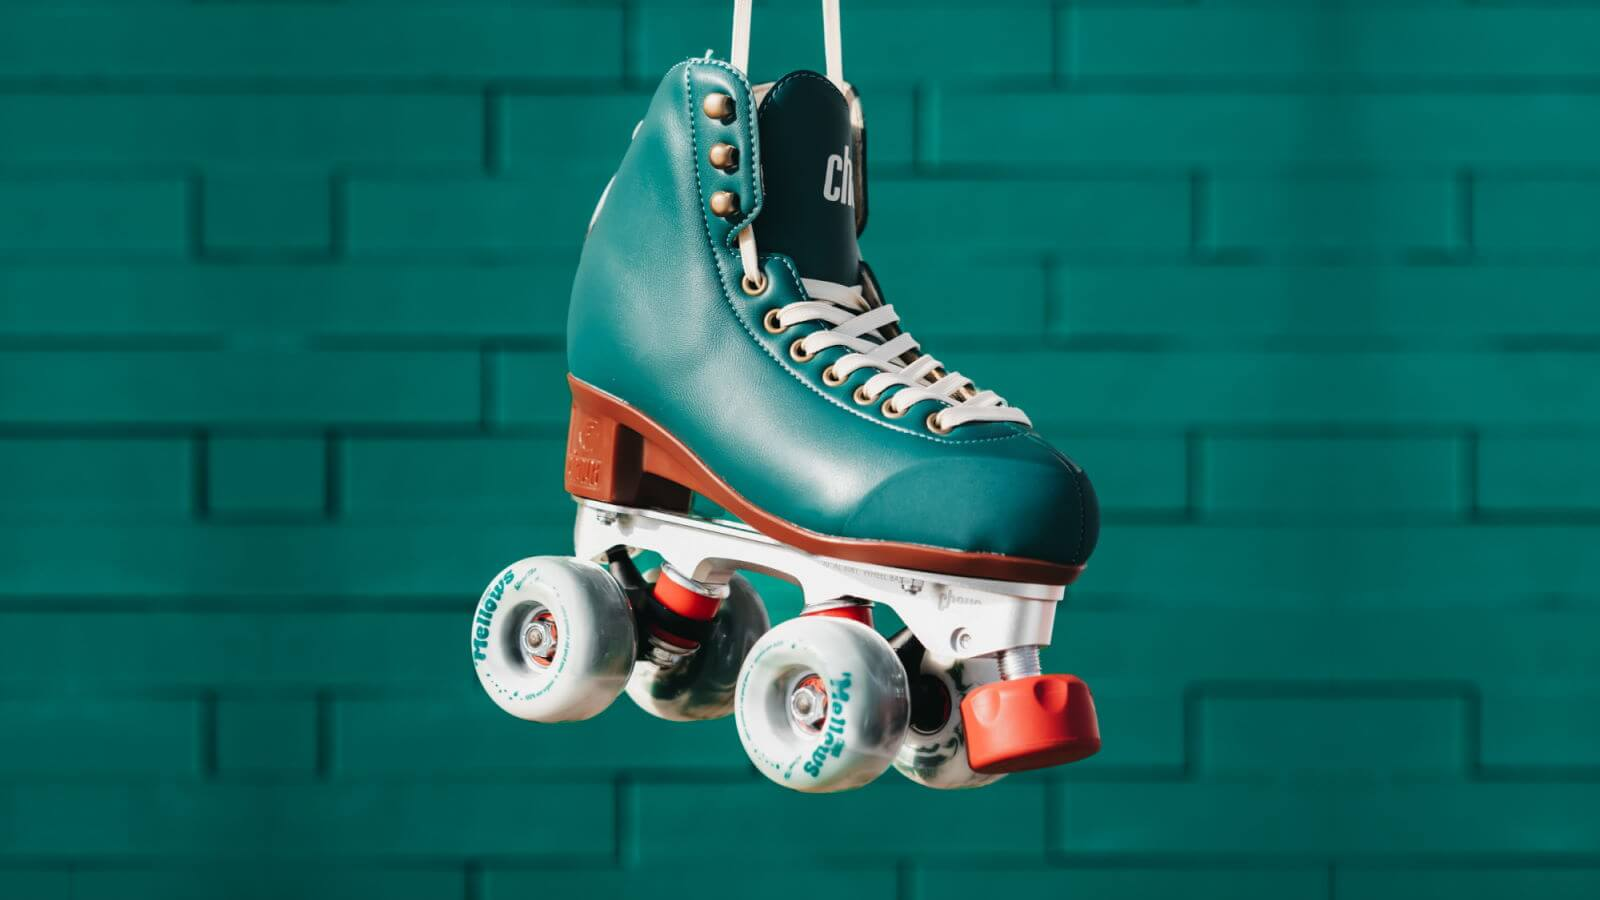 CHAYA Melrose Premium Juniper Green Roller Skates